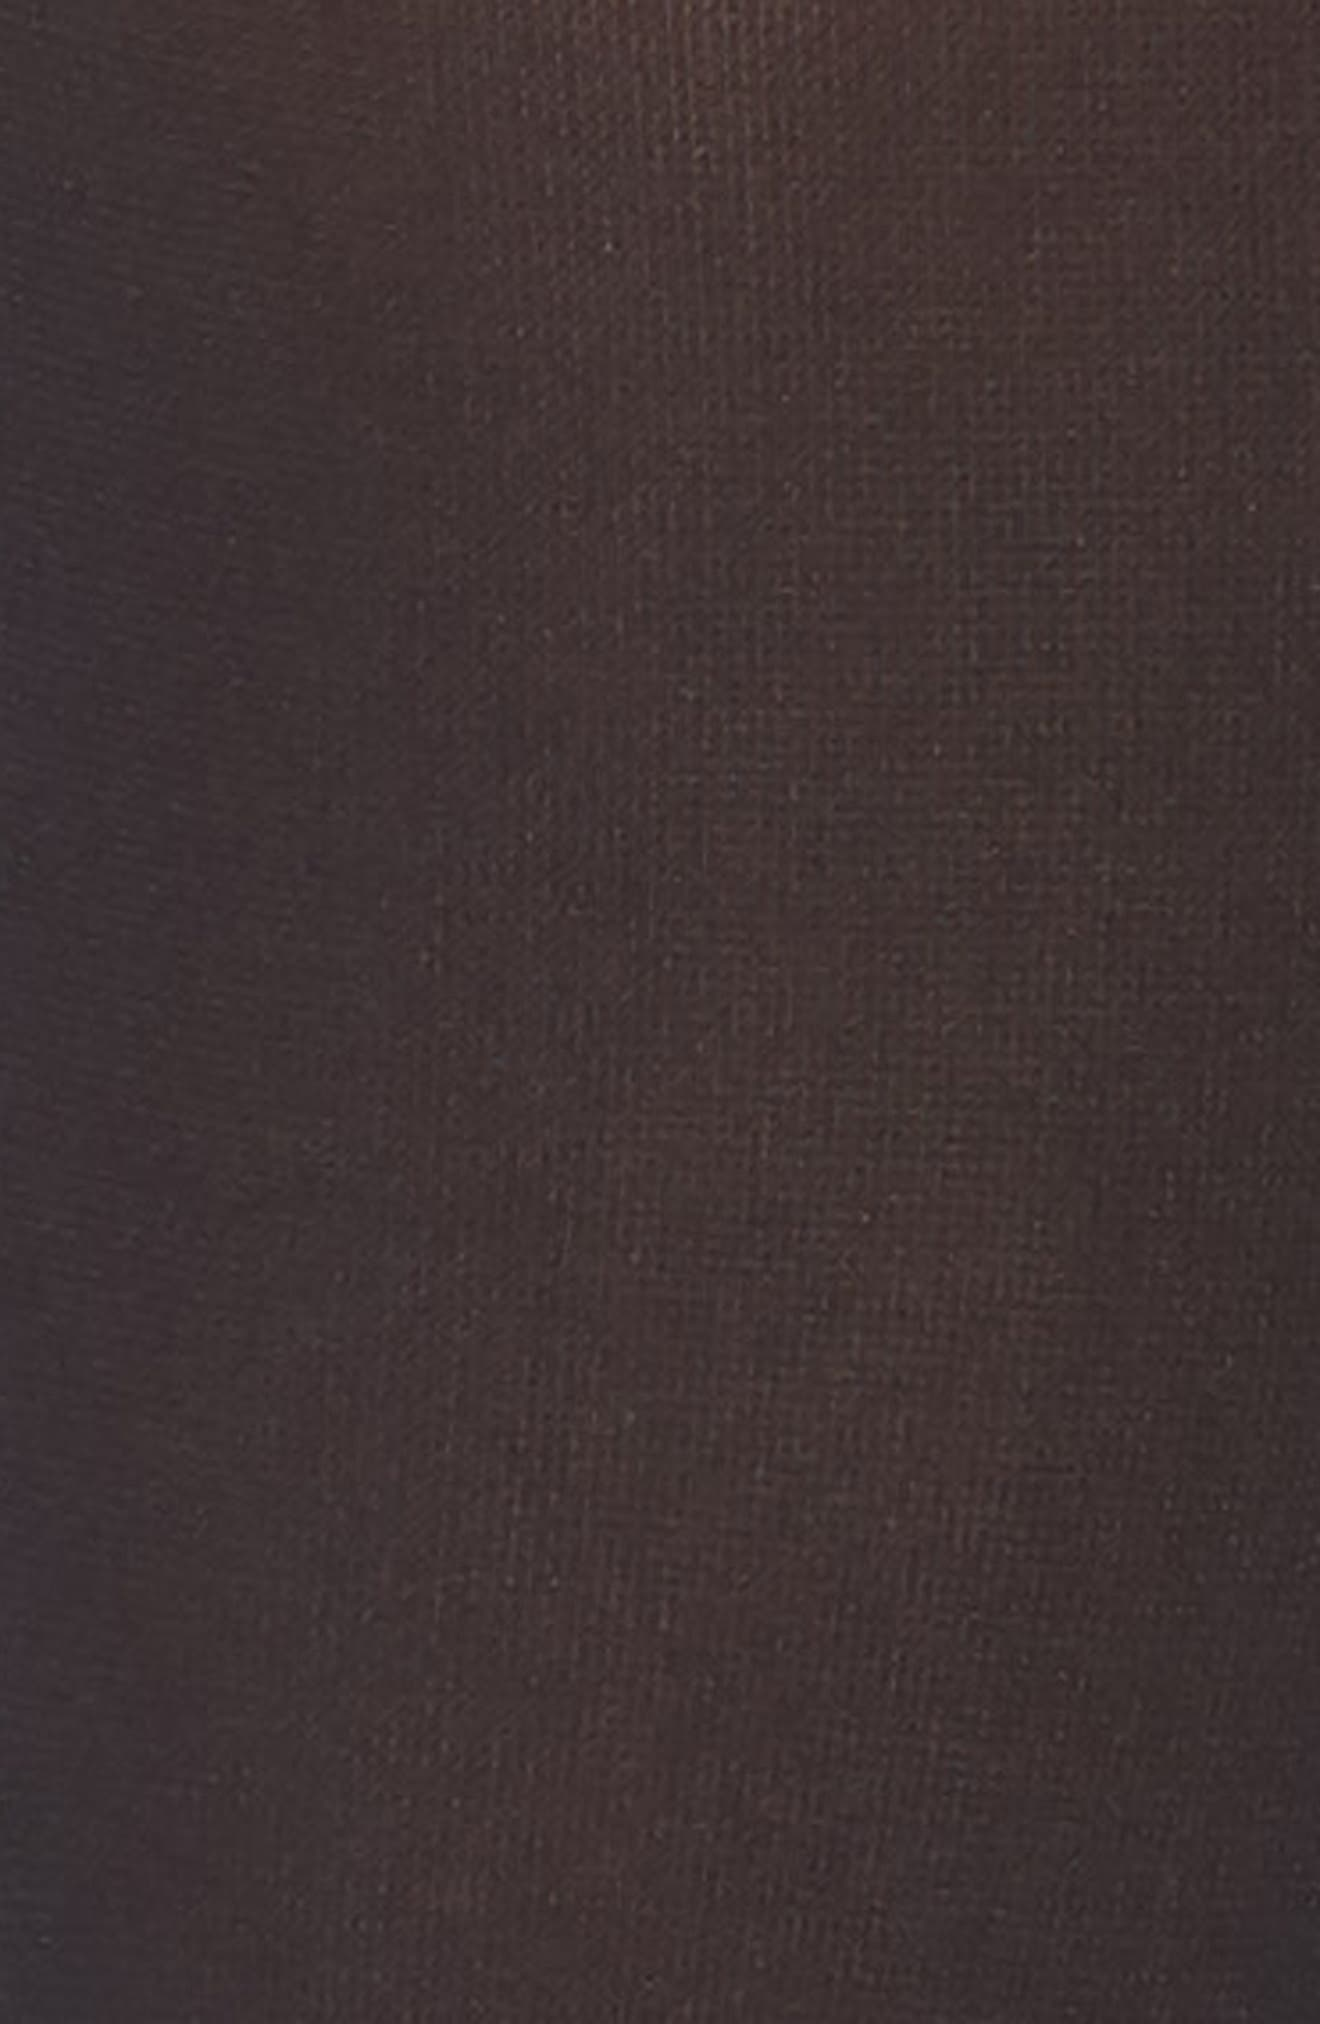 Ingrid Opaque Knee Highs,                             Alternate thumbnail 2, color,                             Black